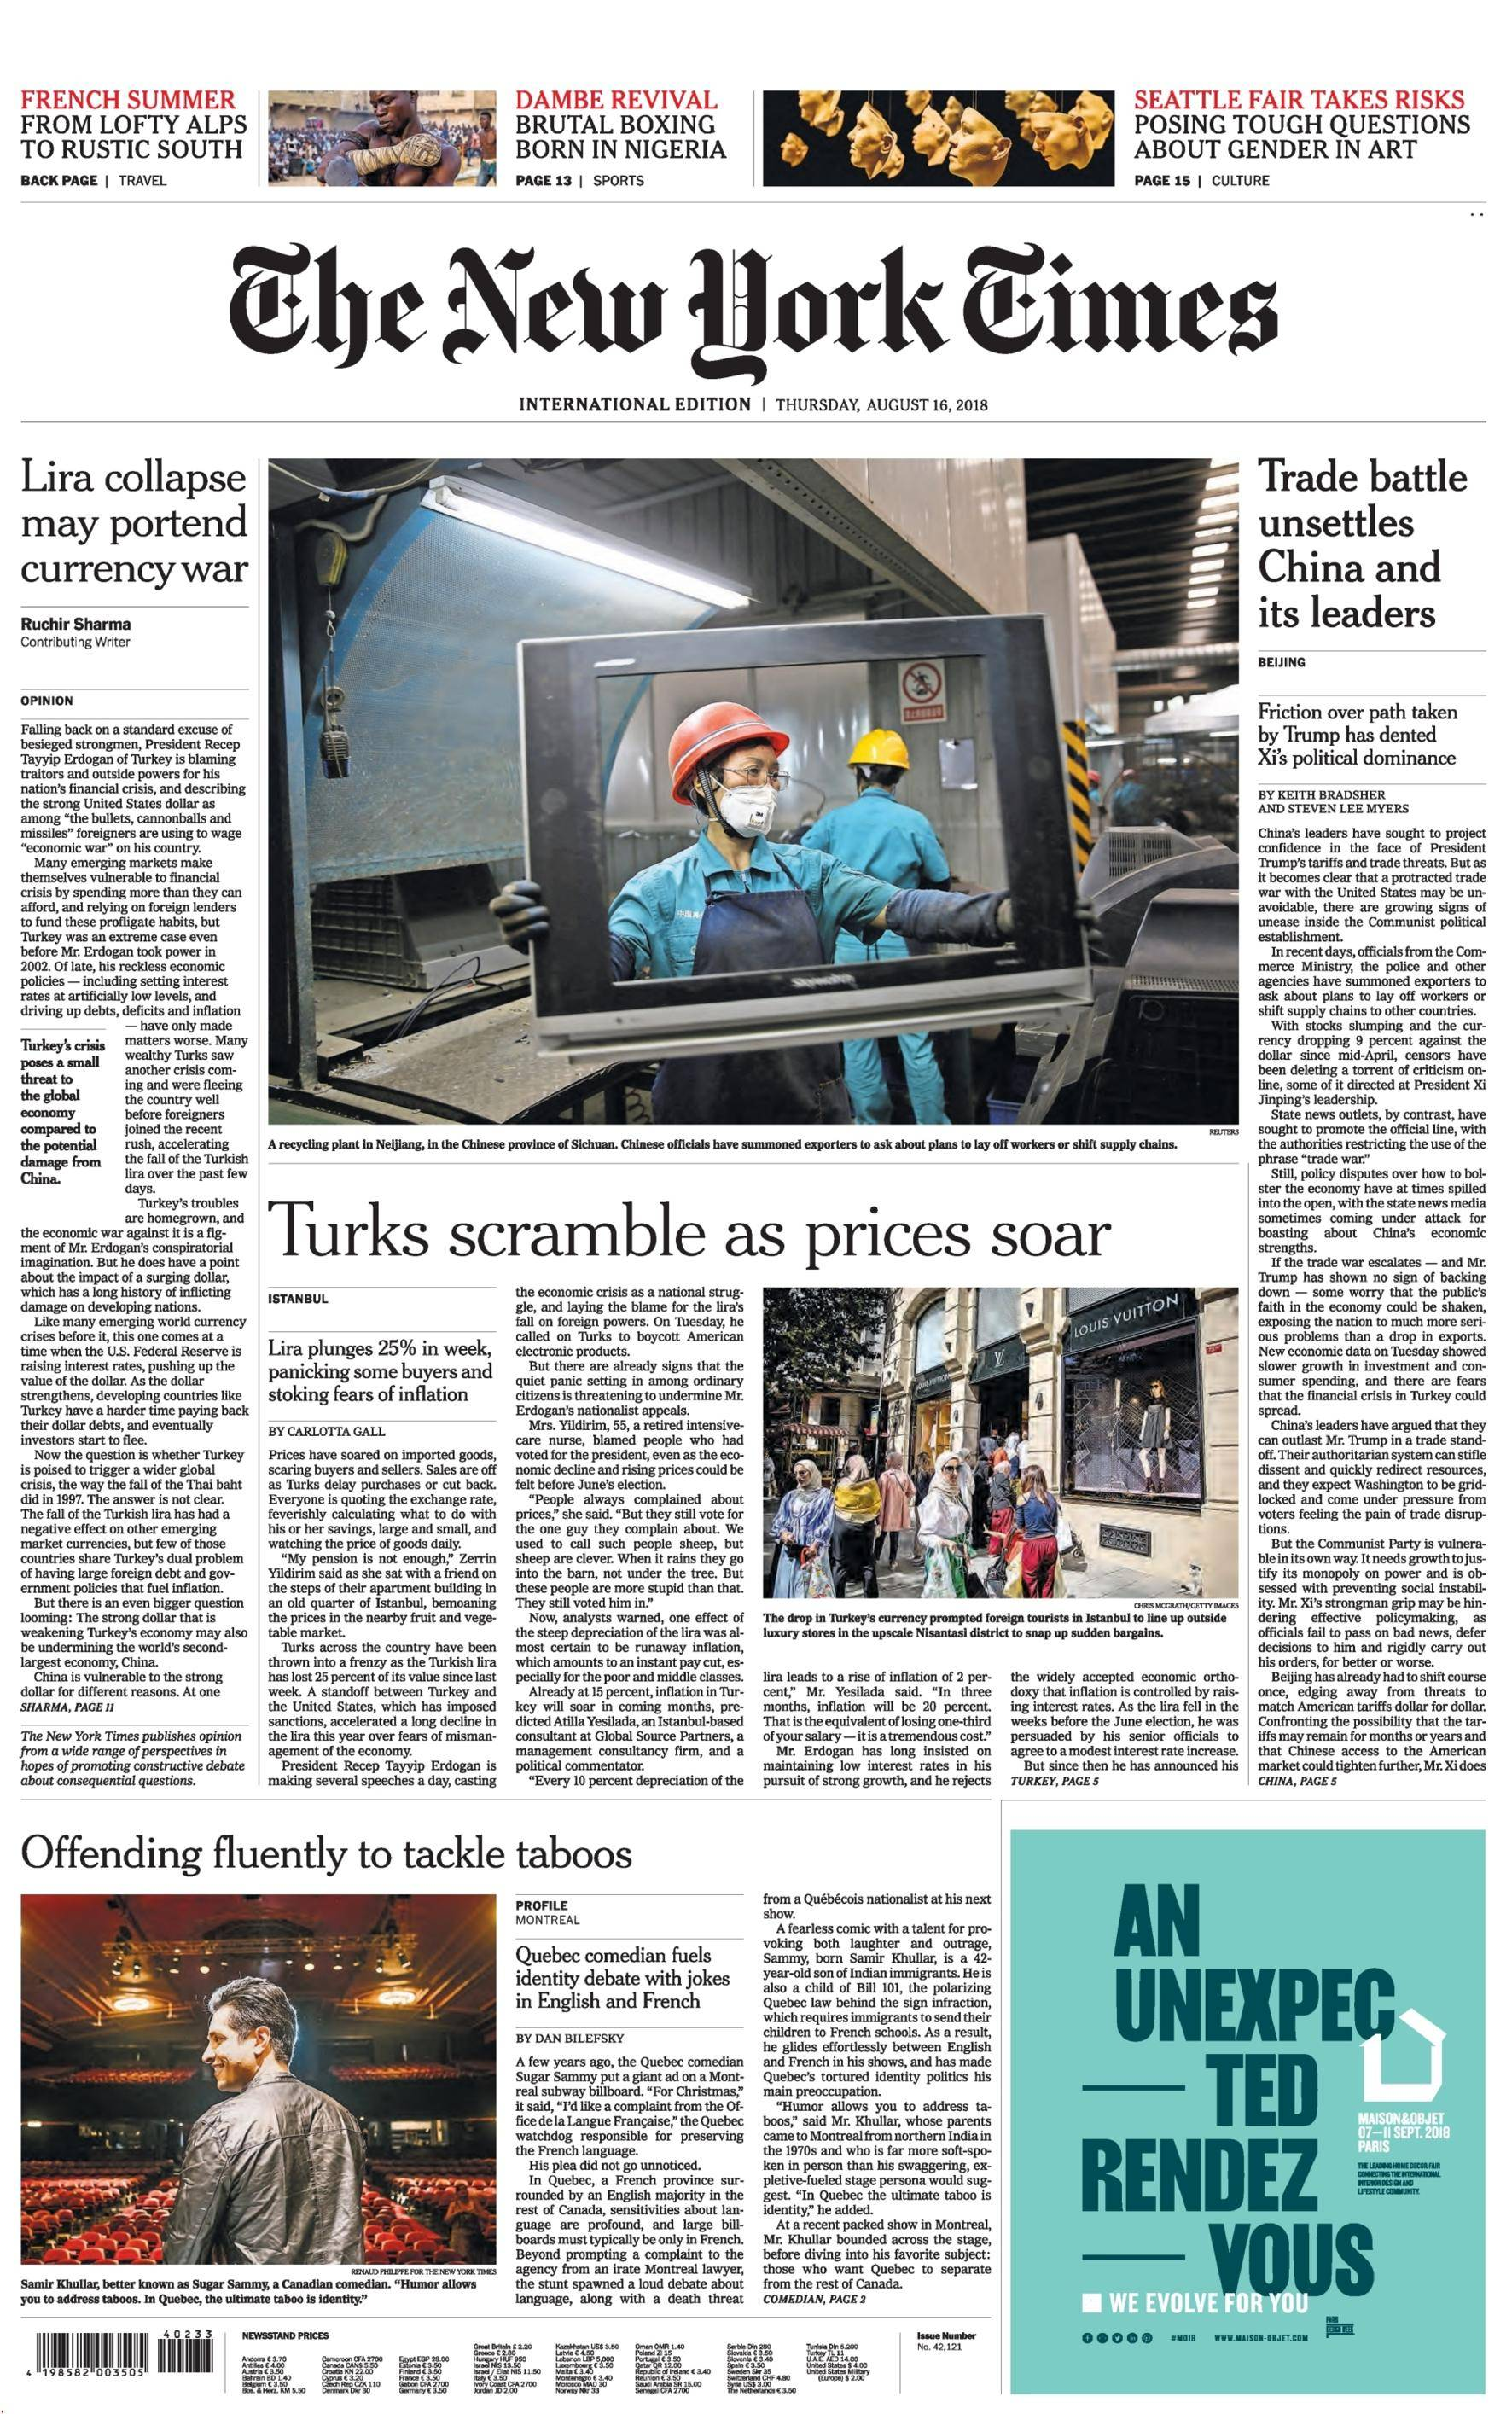 International New York Times - 16 August 2018